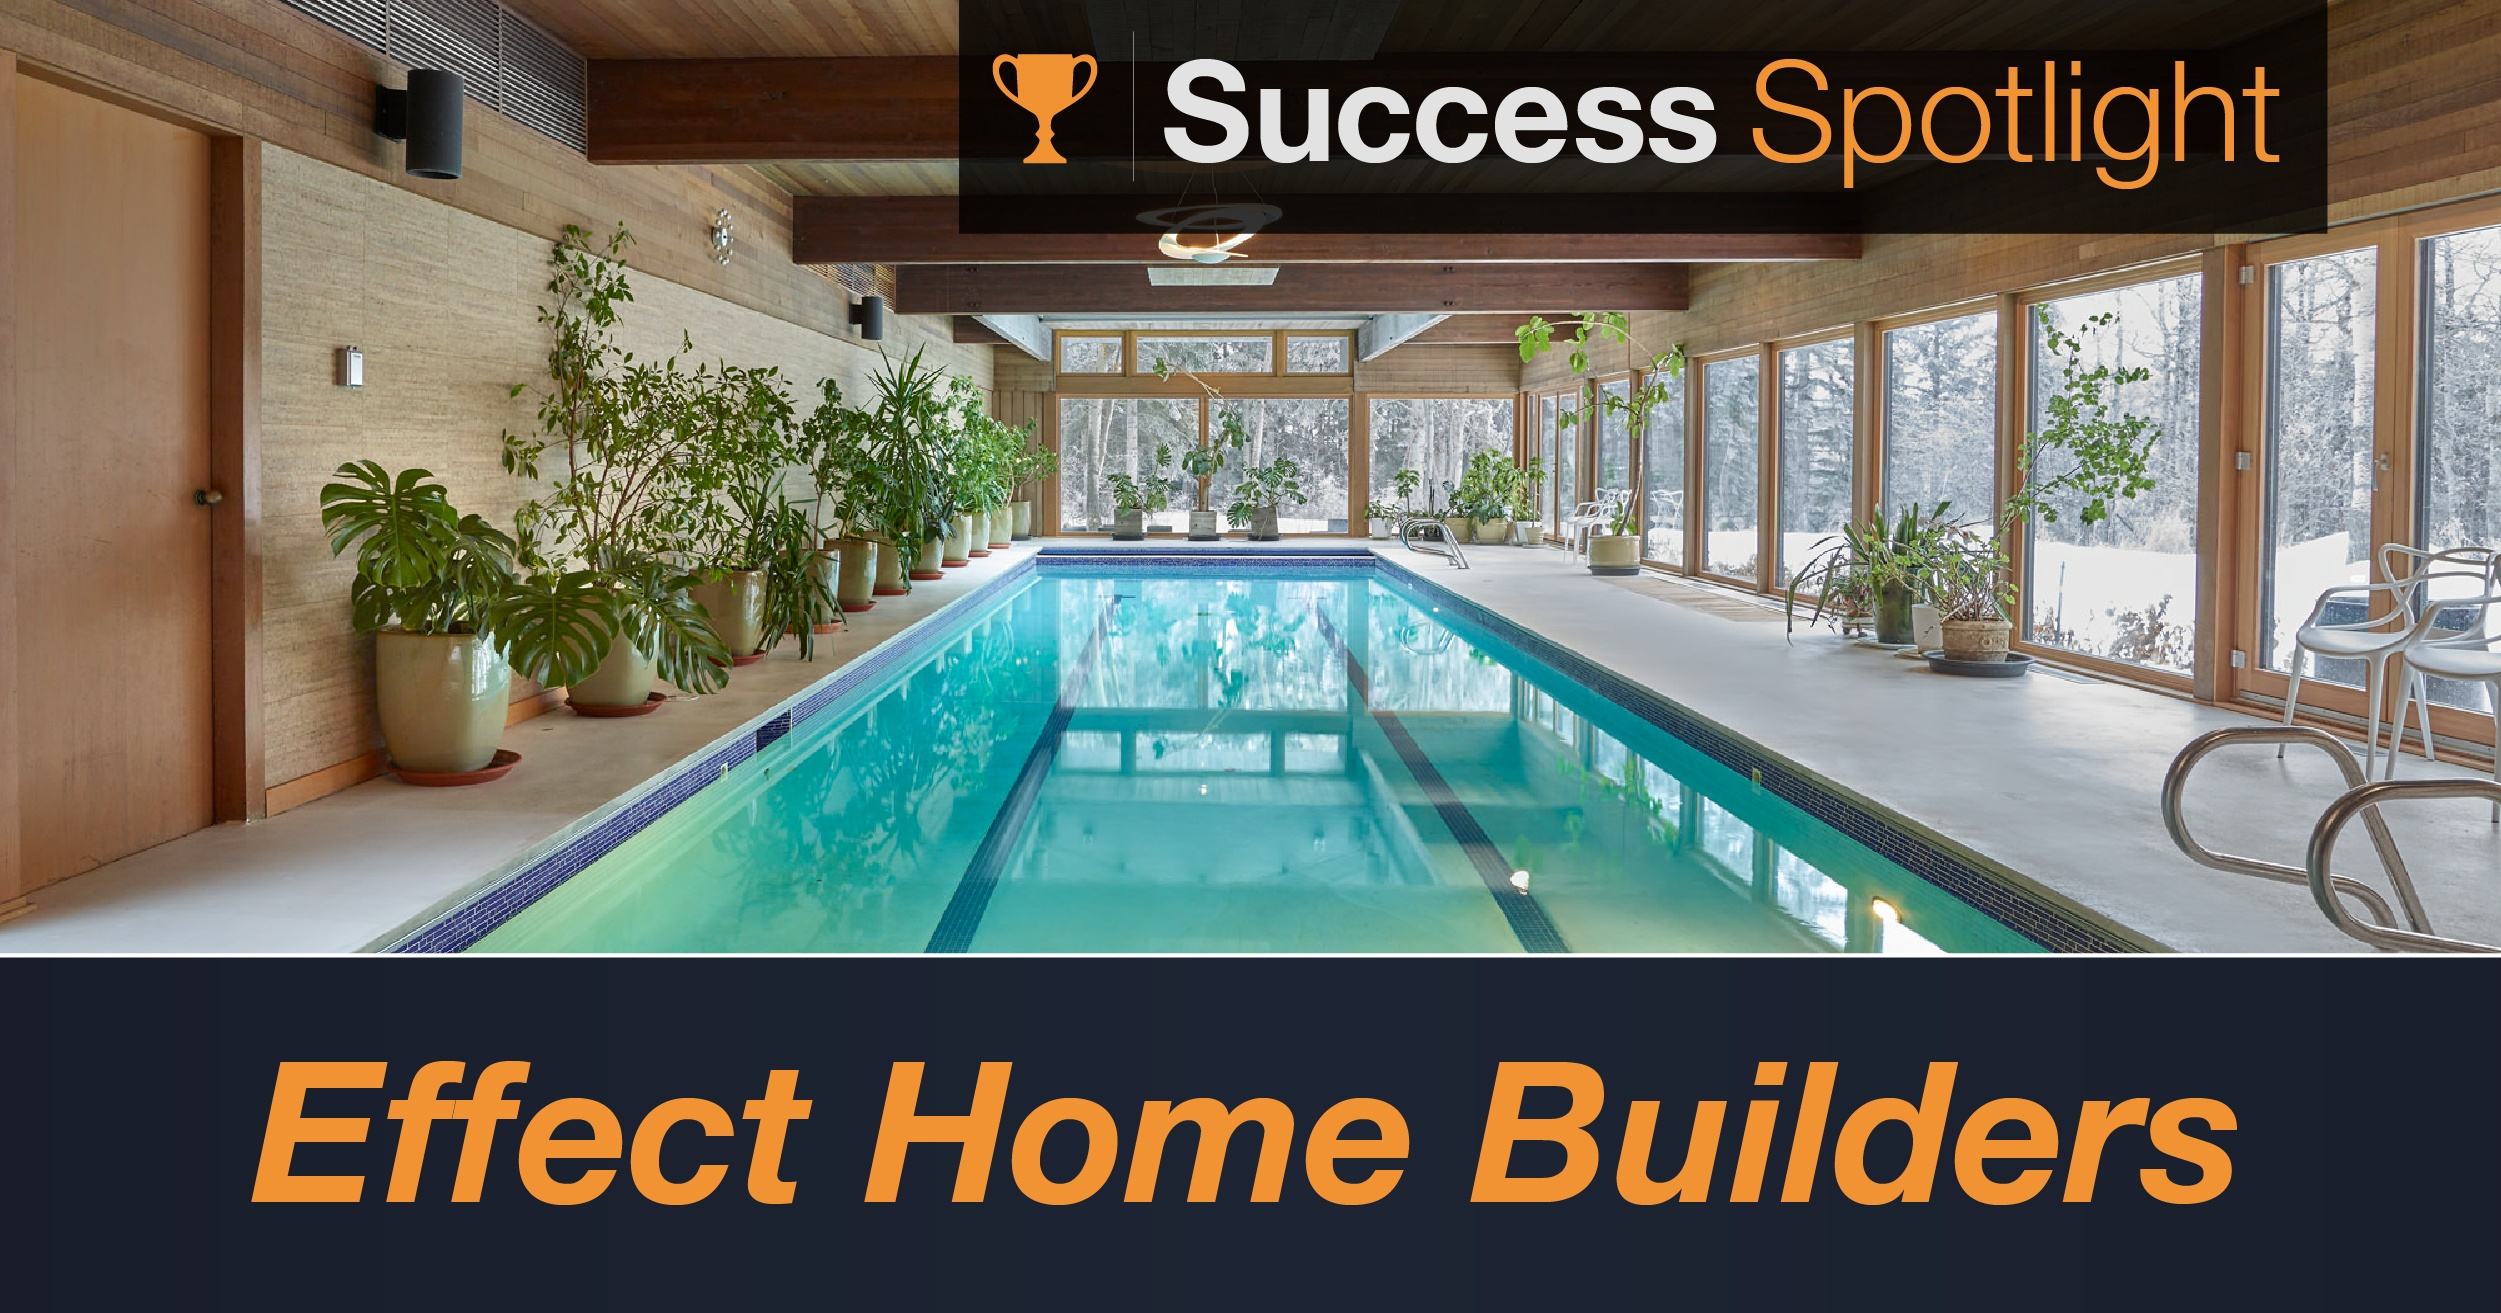 Success Spotlight: Effect Home Builders